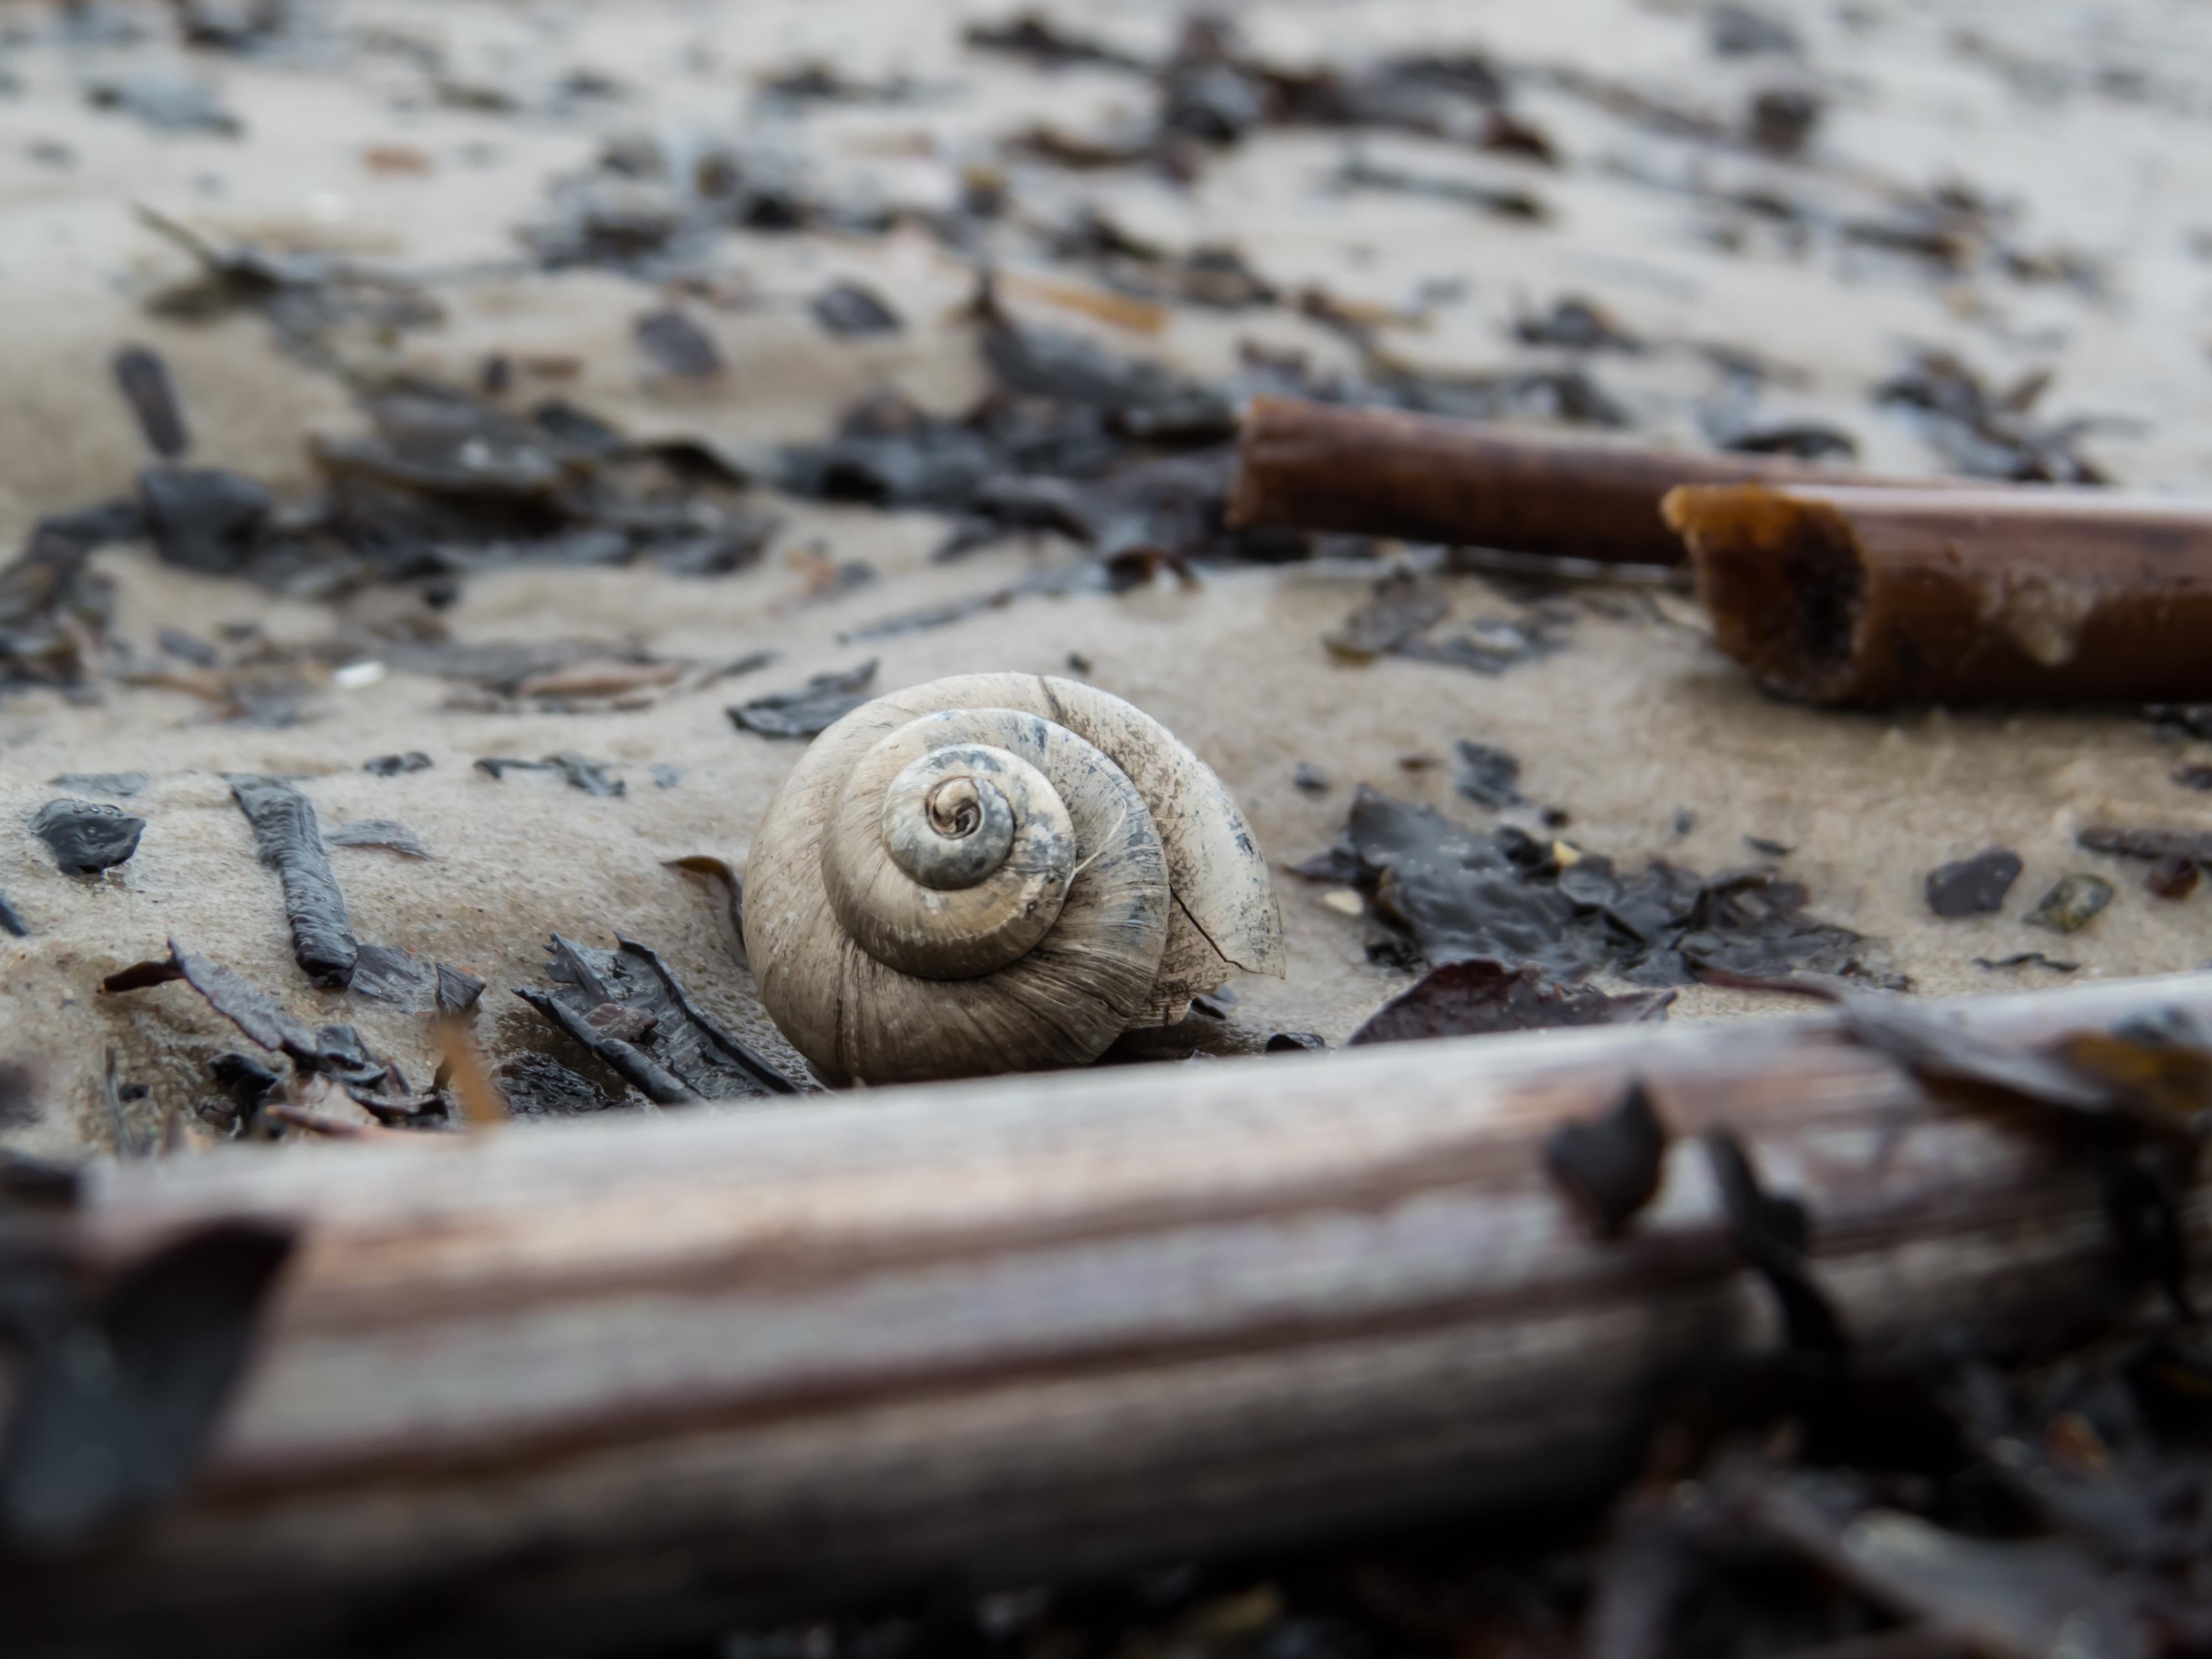 Sea snail photo